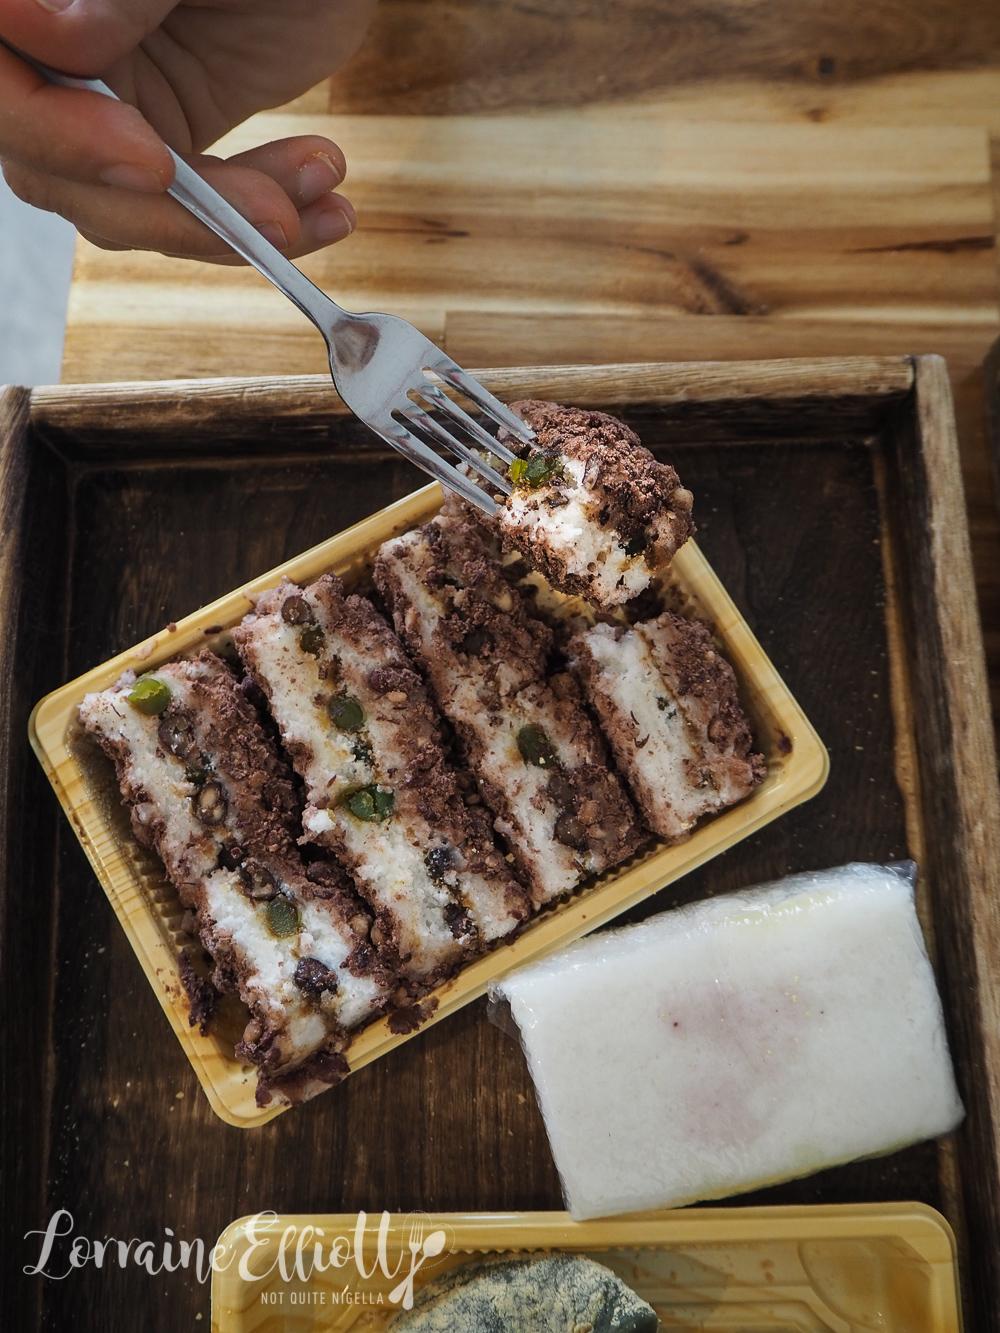 Siroo Rice Cake Cafe, West Ryde